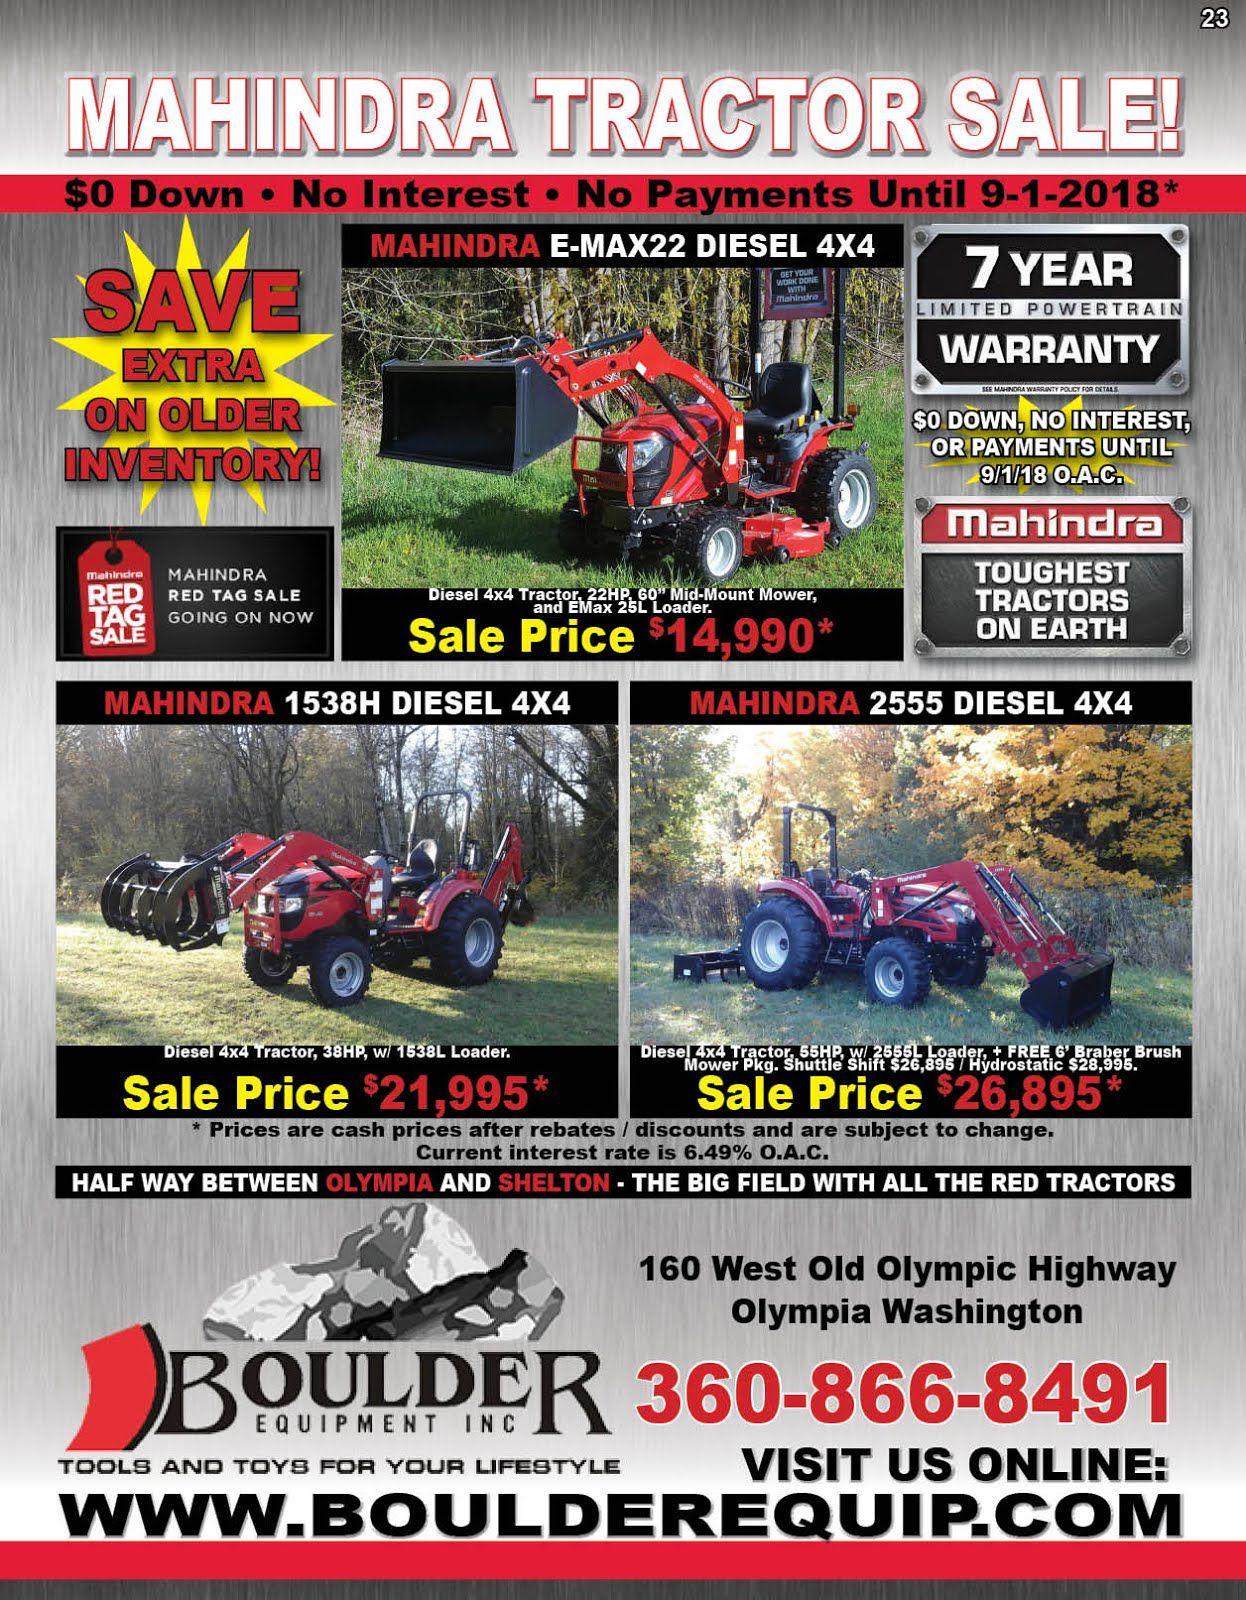 Boulder Equipment Mahindra Tractor Sale Tractors For Sale Mahindra Tractor Equipment Trailers